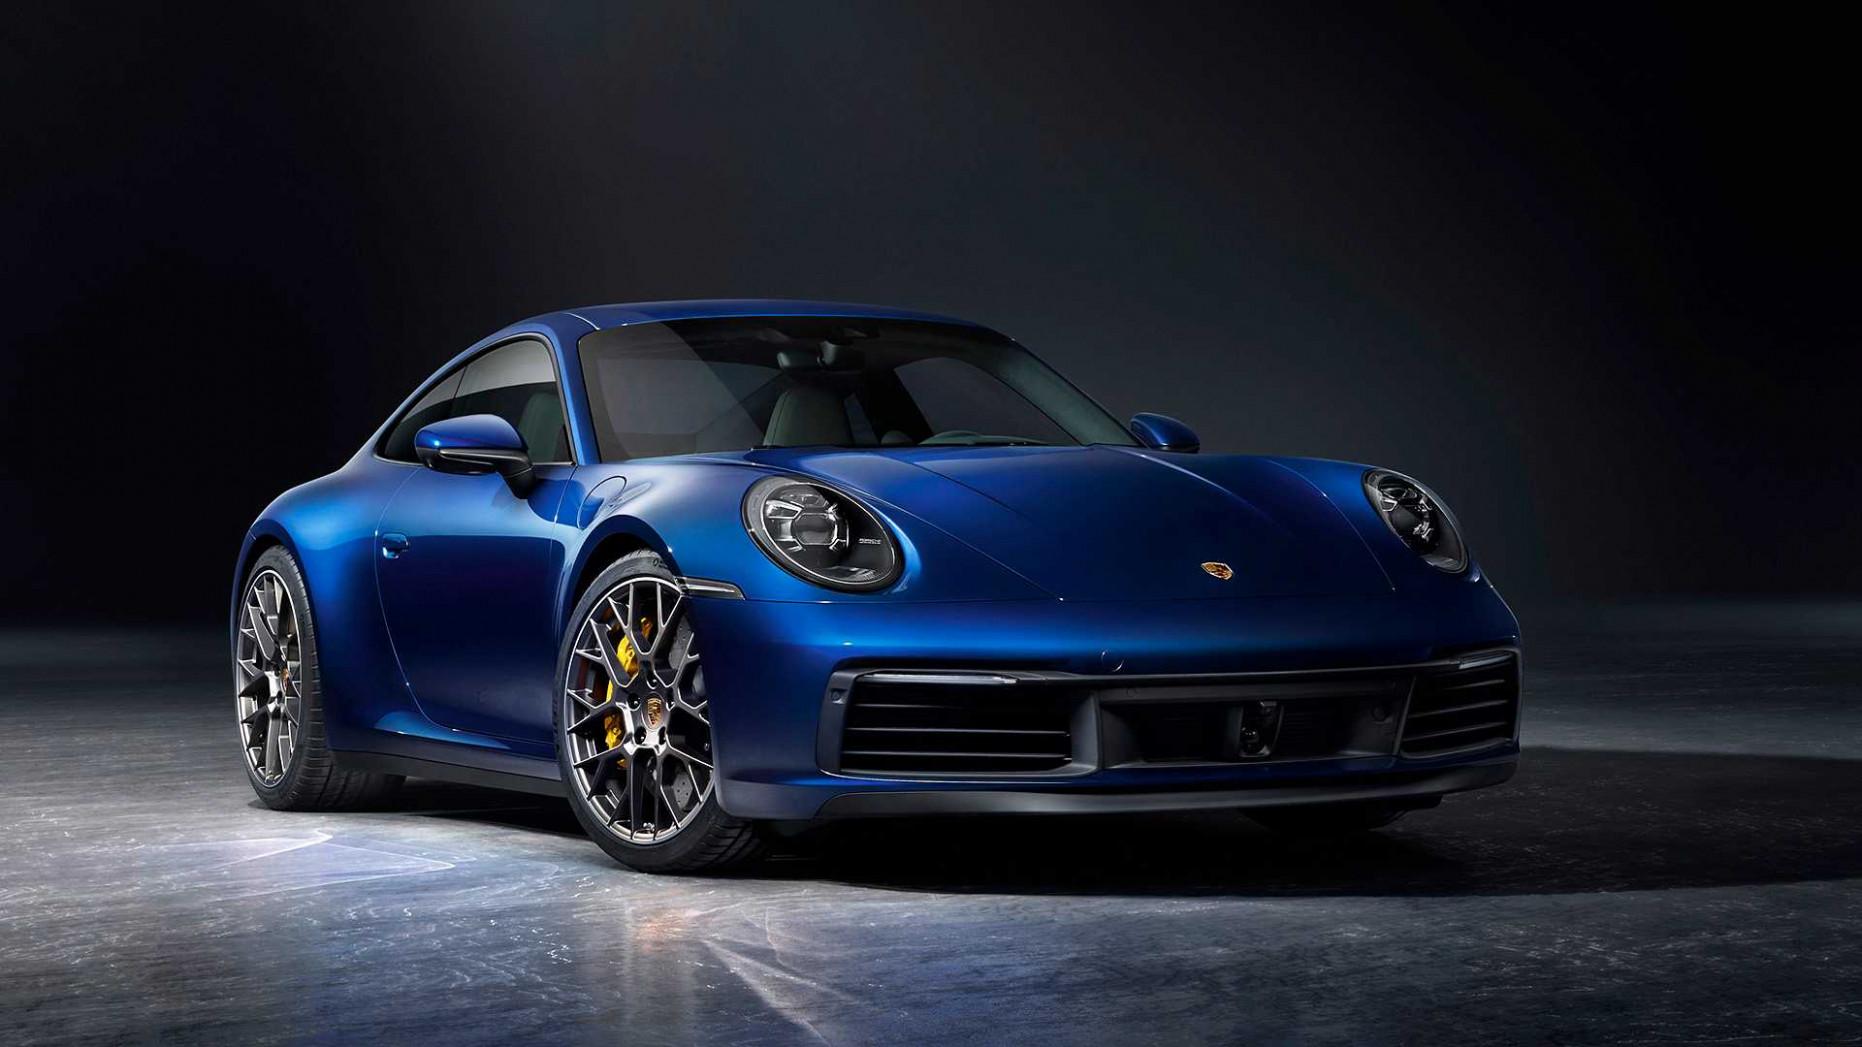 New Concept 2022 Porsche Cayenne Turbo S